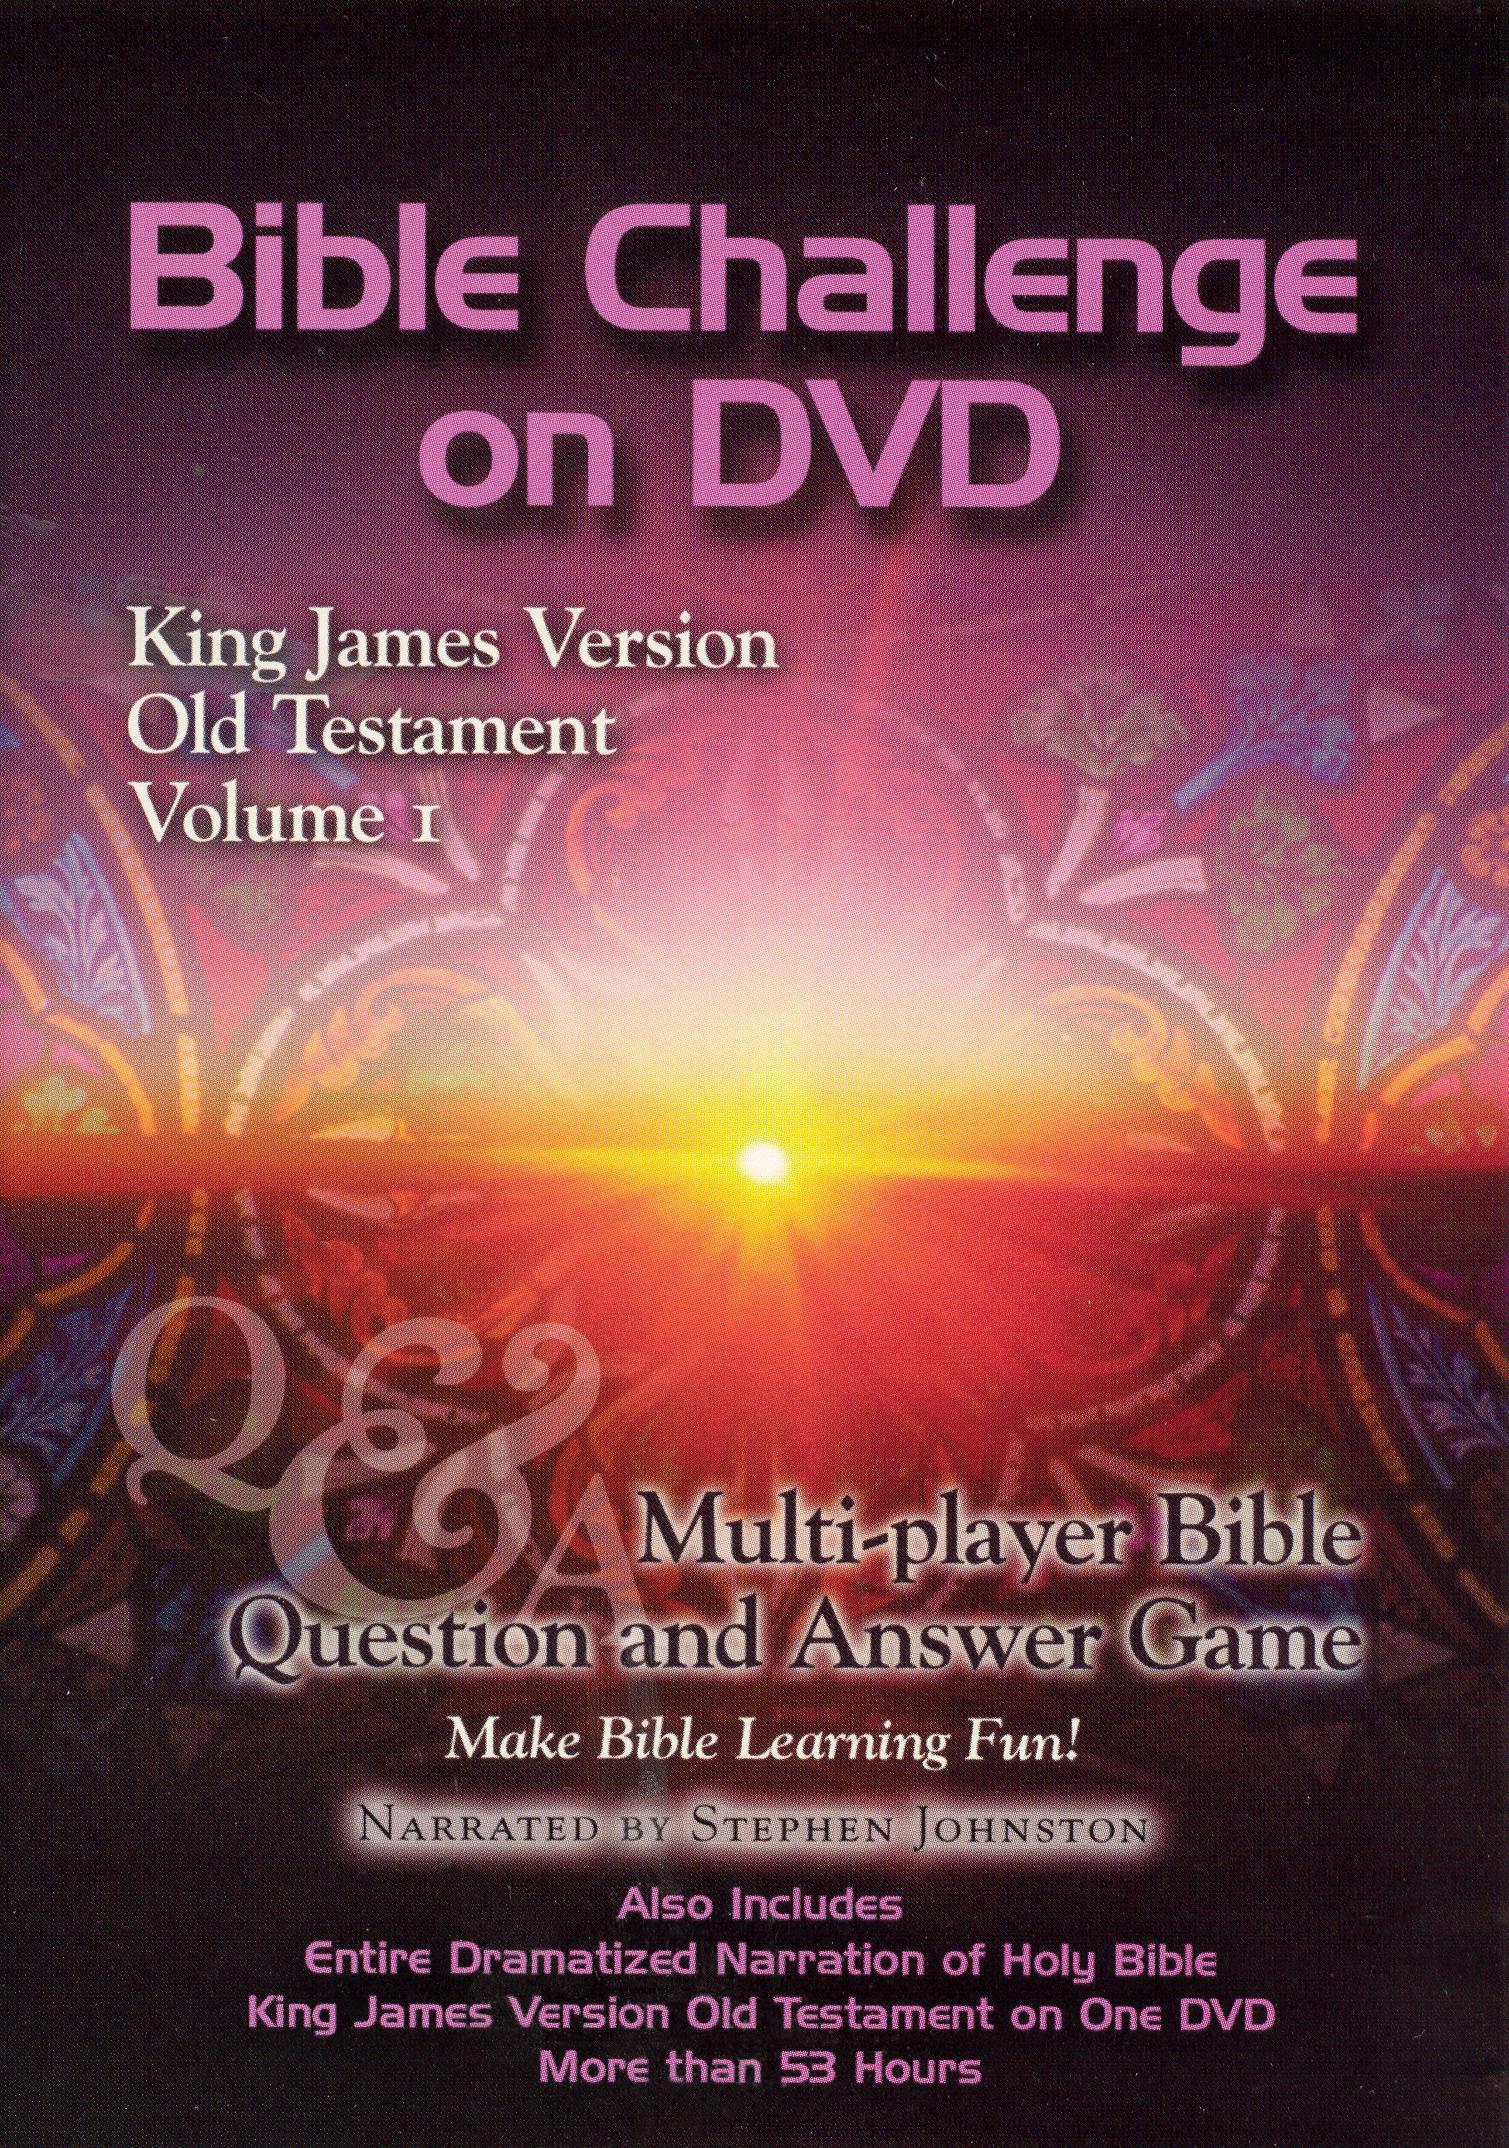 Bible Challenge on DVD: King James Version - Old Testament, Vol. 1